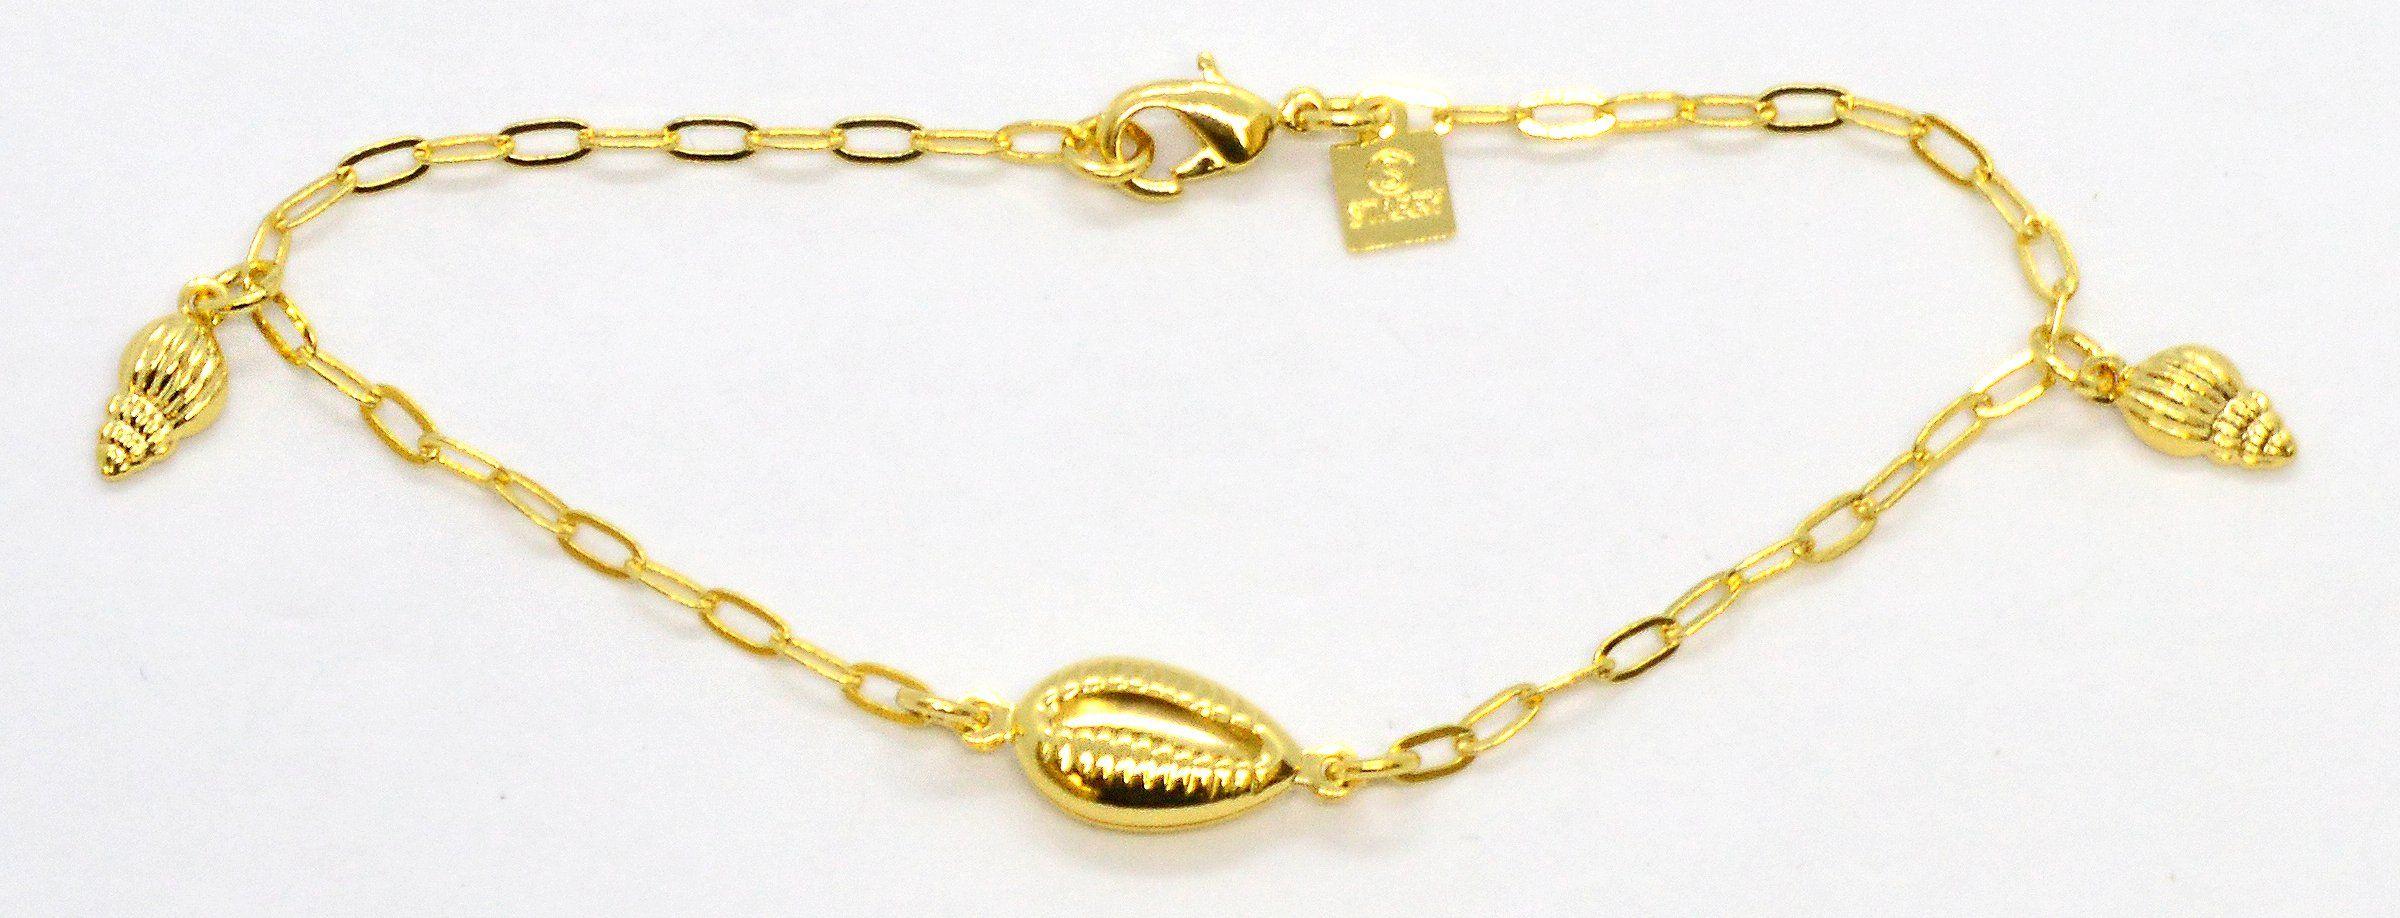 (1-0927-k6) Brazilian Gold Overlay Shell Charms Bracelet, 7